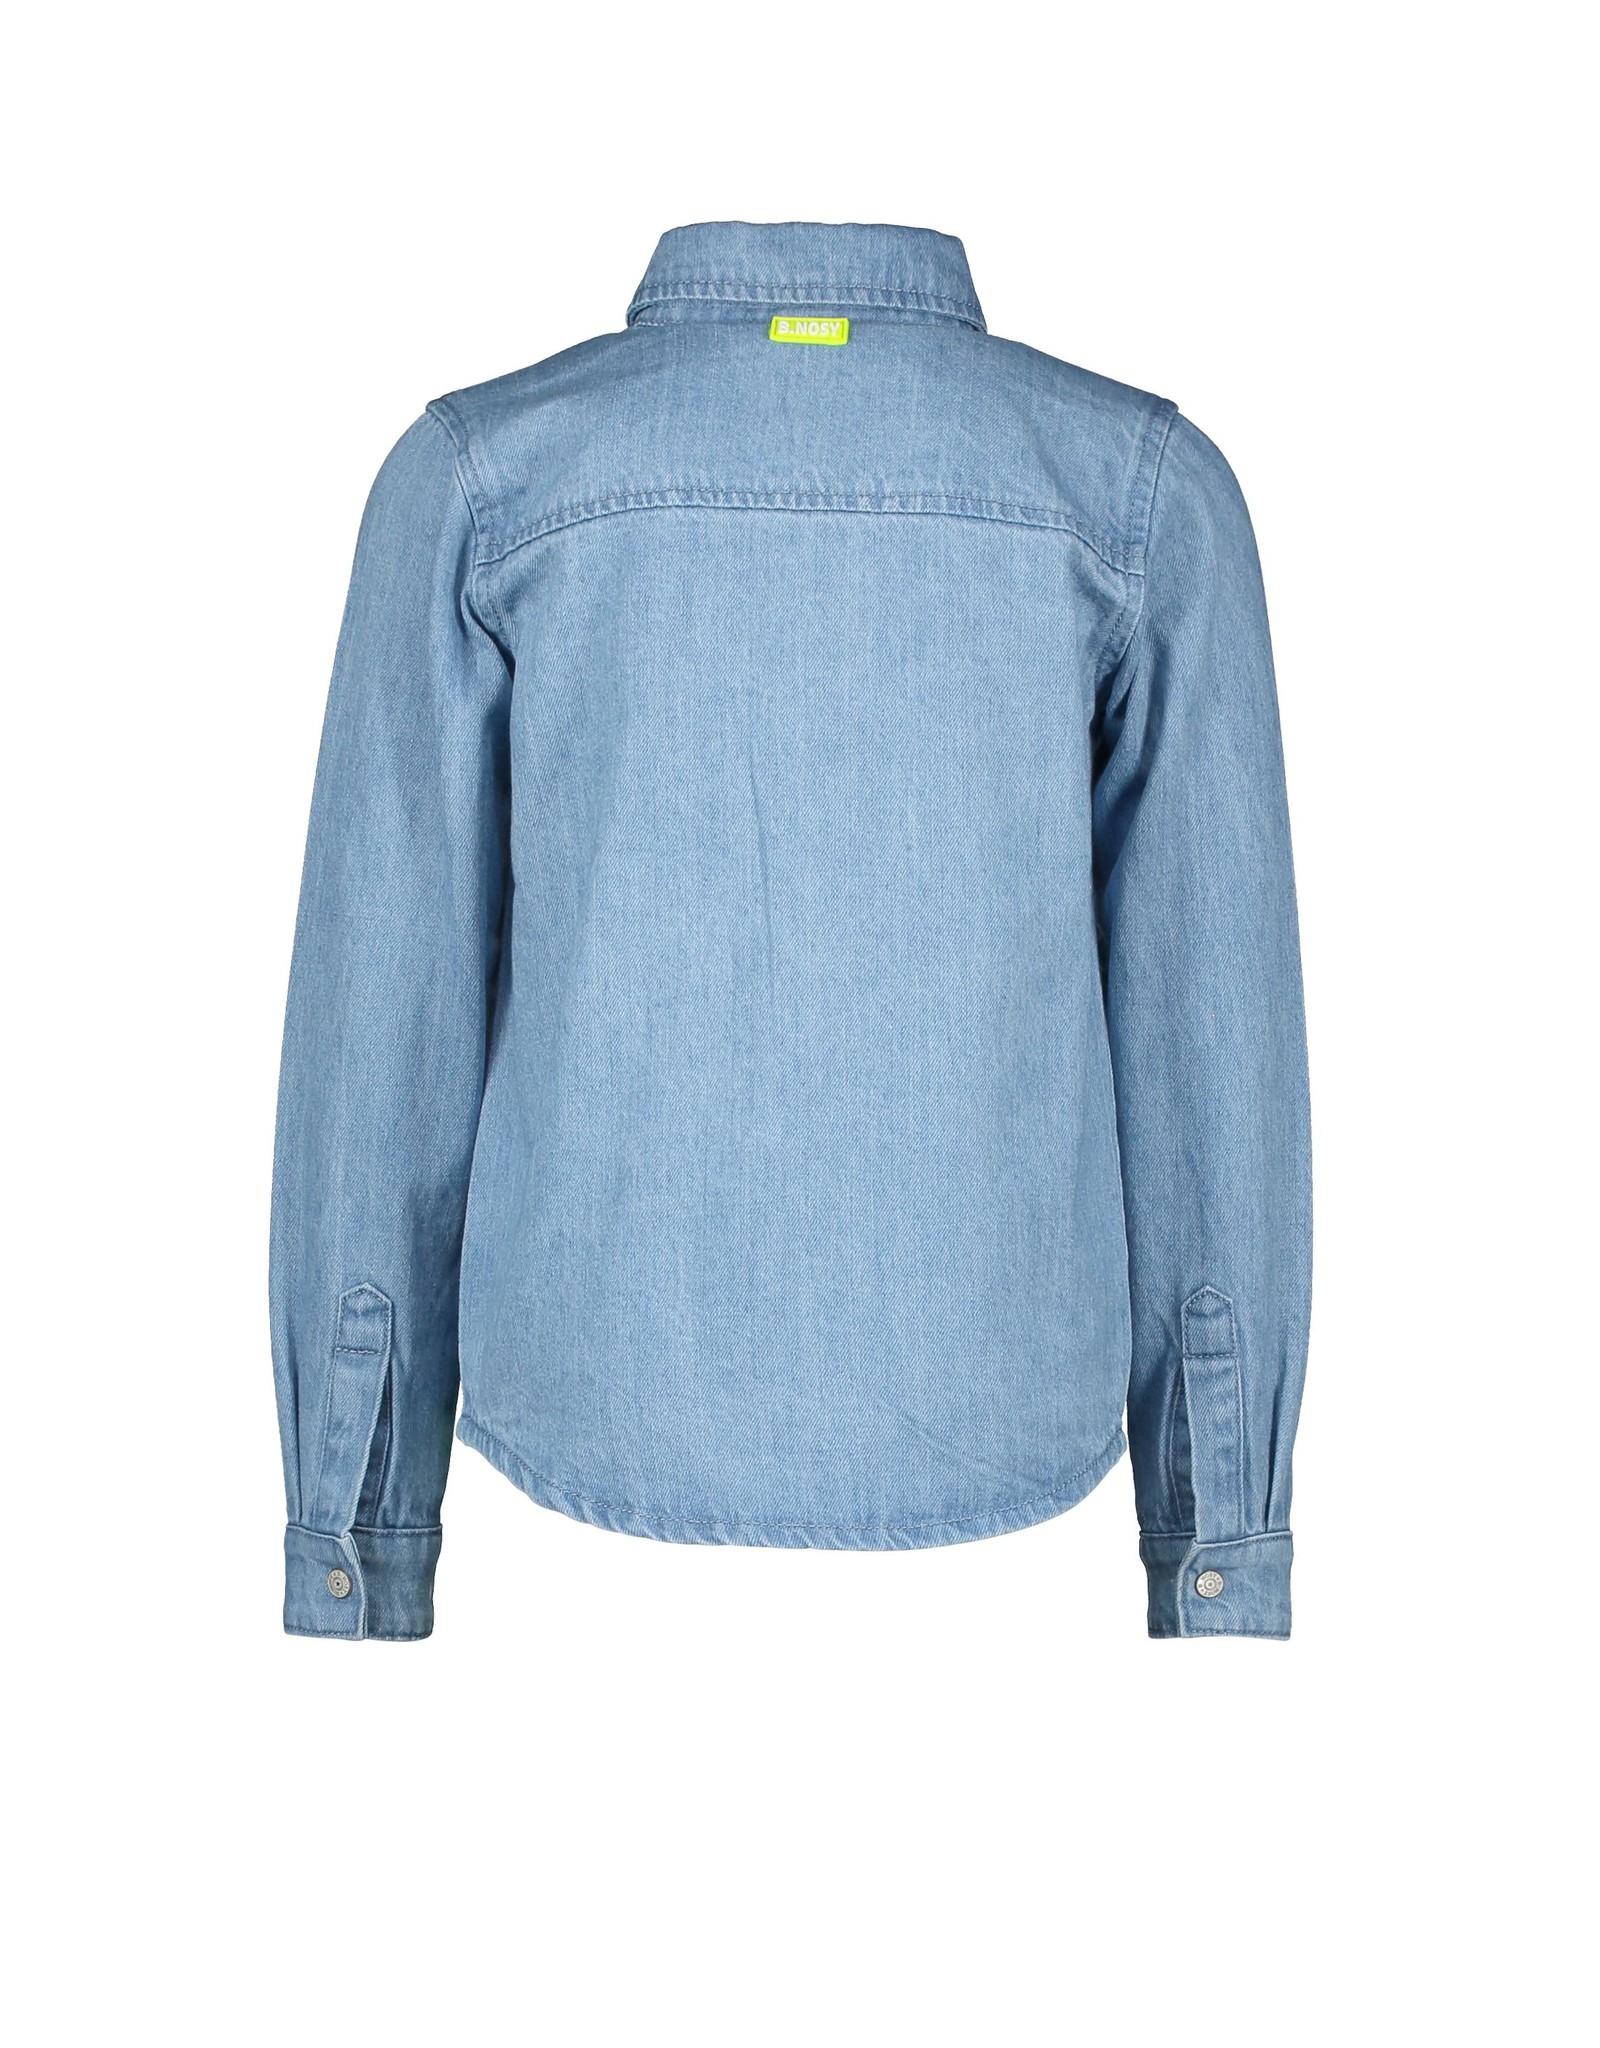 B-Nosy Boys denim blouse with press buttons, Free denim